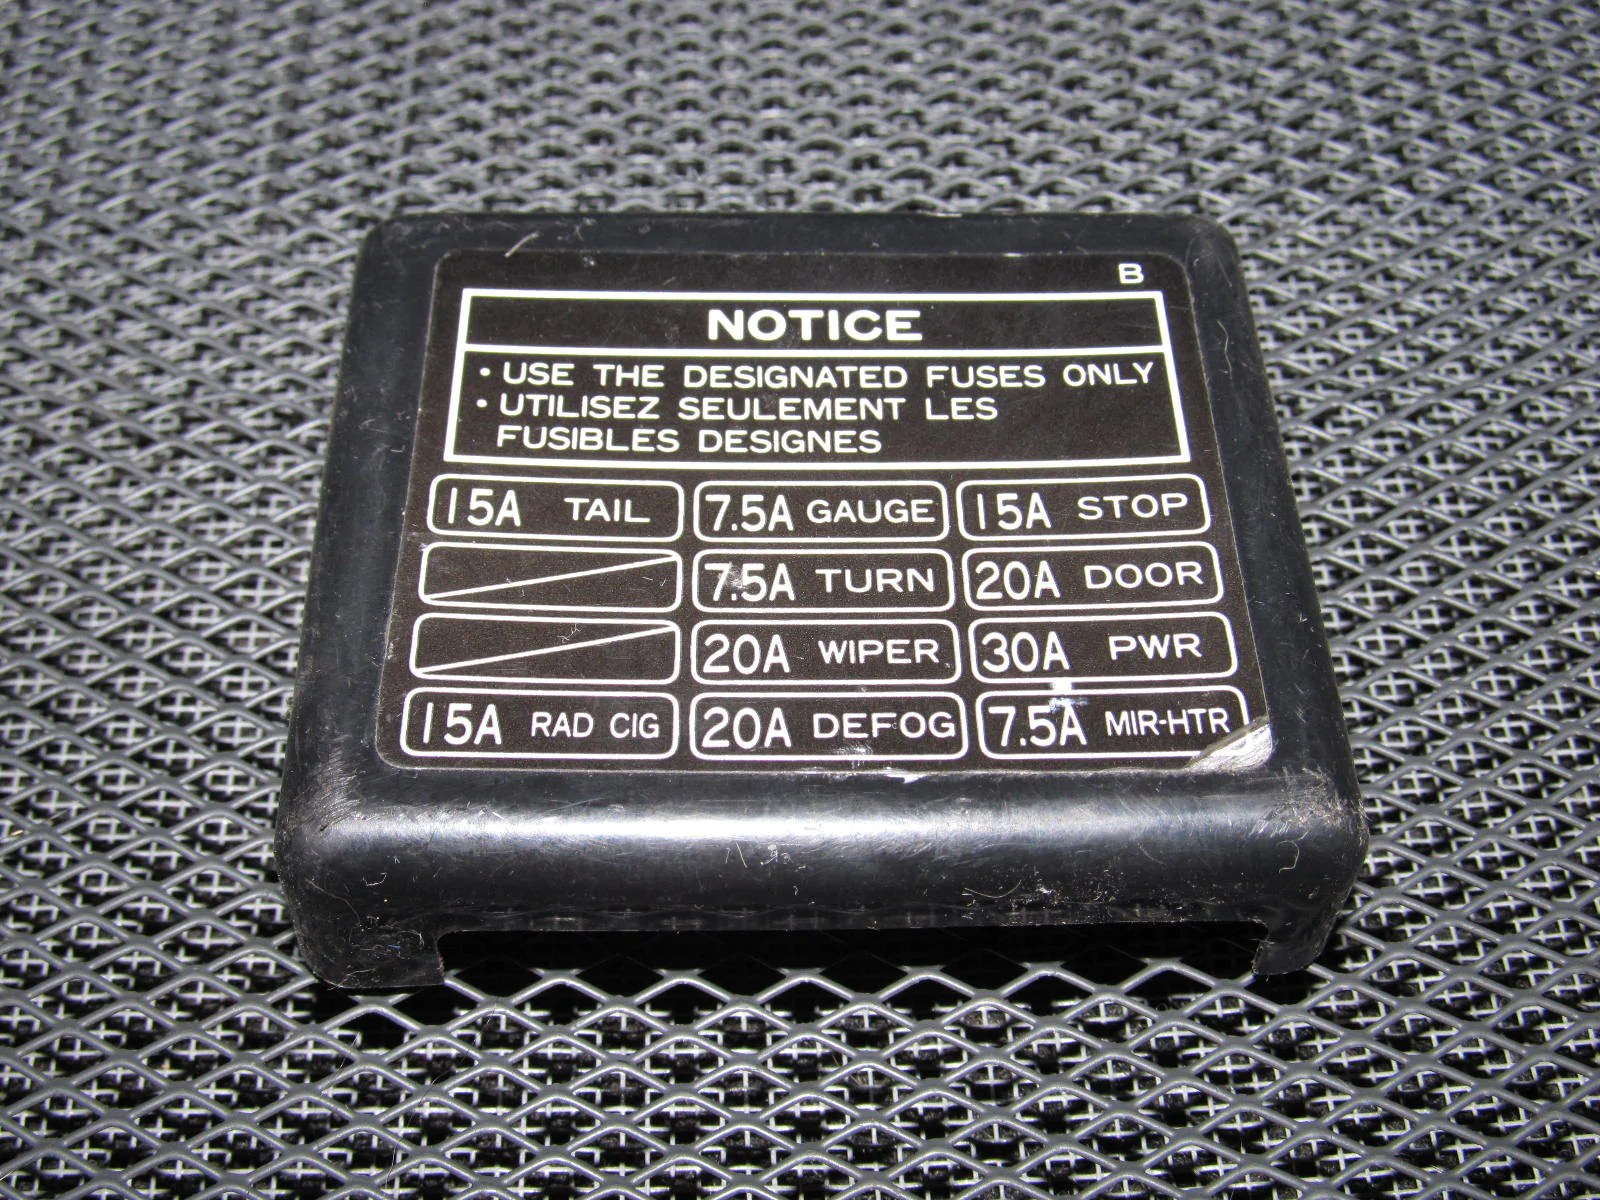 1991 mr2 fuse box wiring diagram todays toyota mr2 fuse box diagram 91 toyota mr2 fuse [ 1600 x 1200 Pixel ]